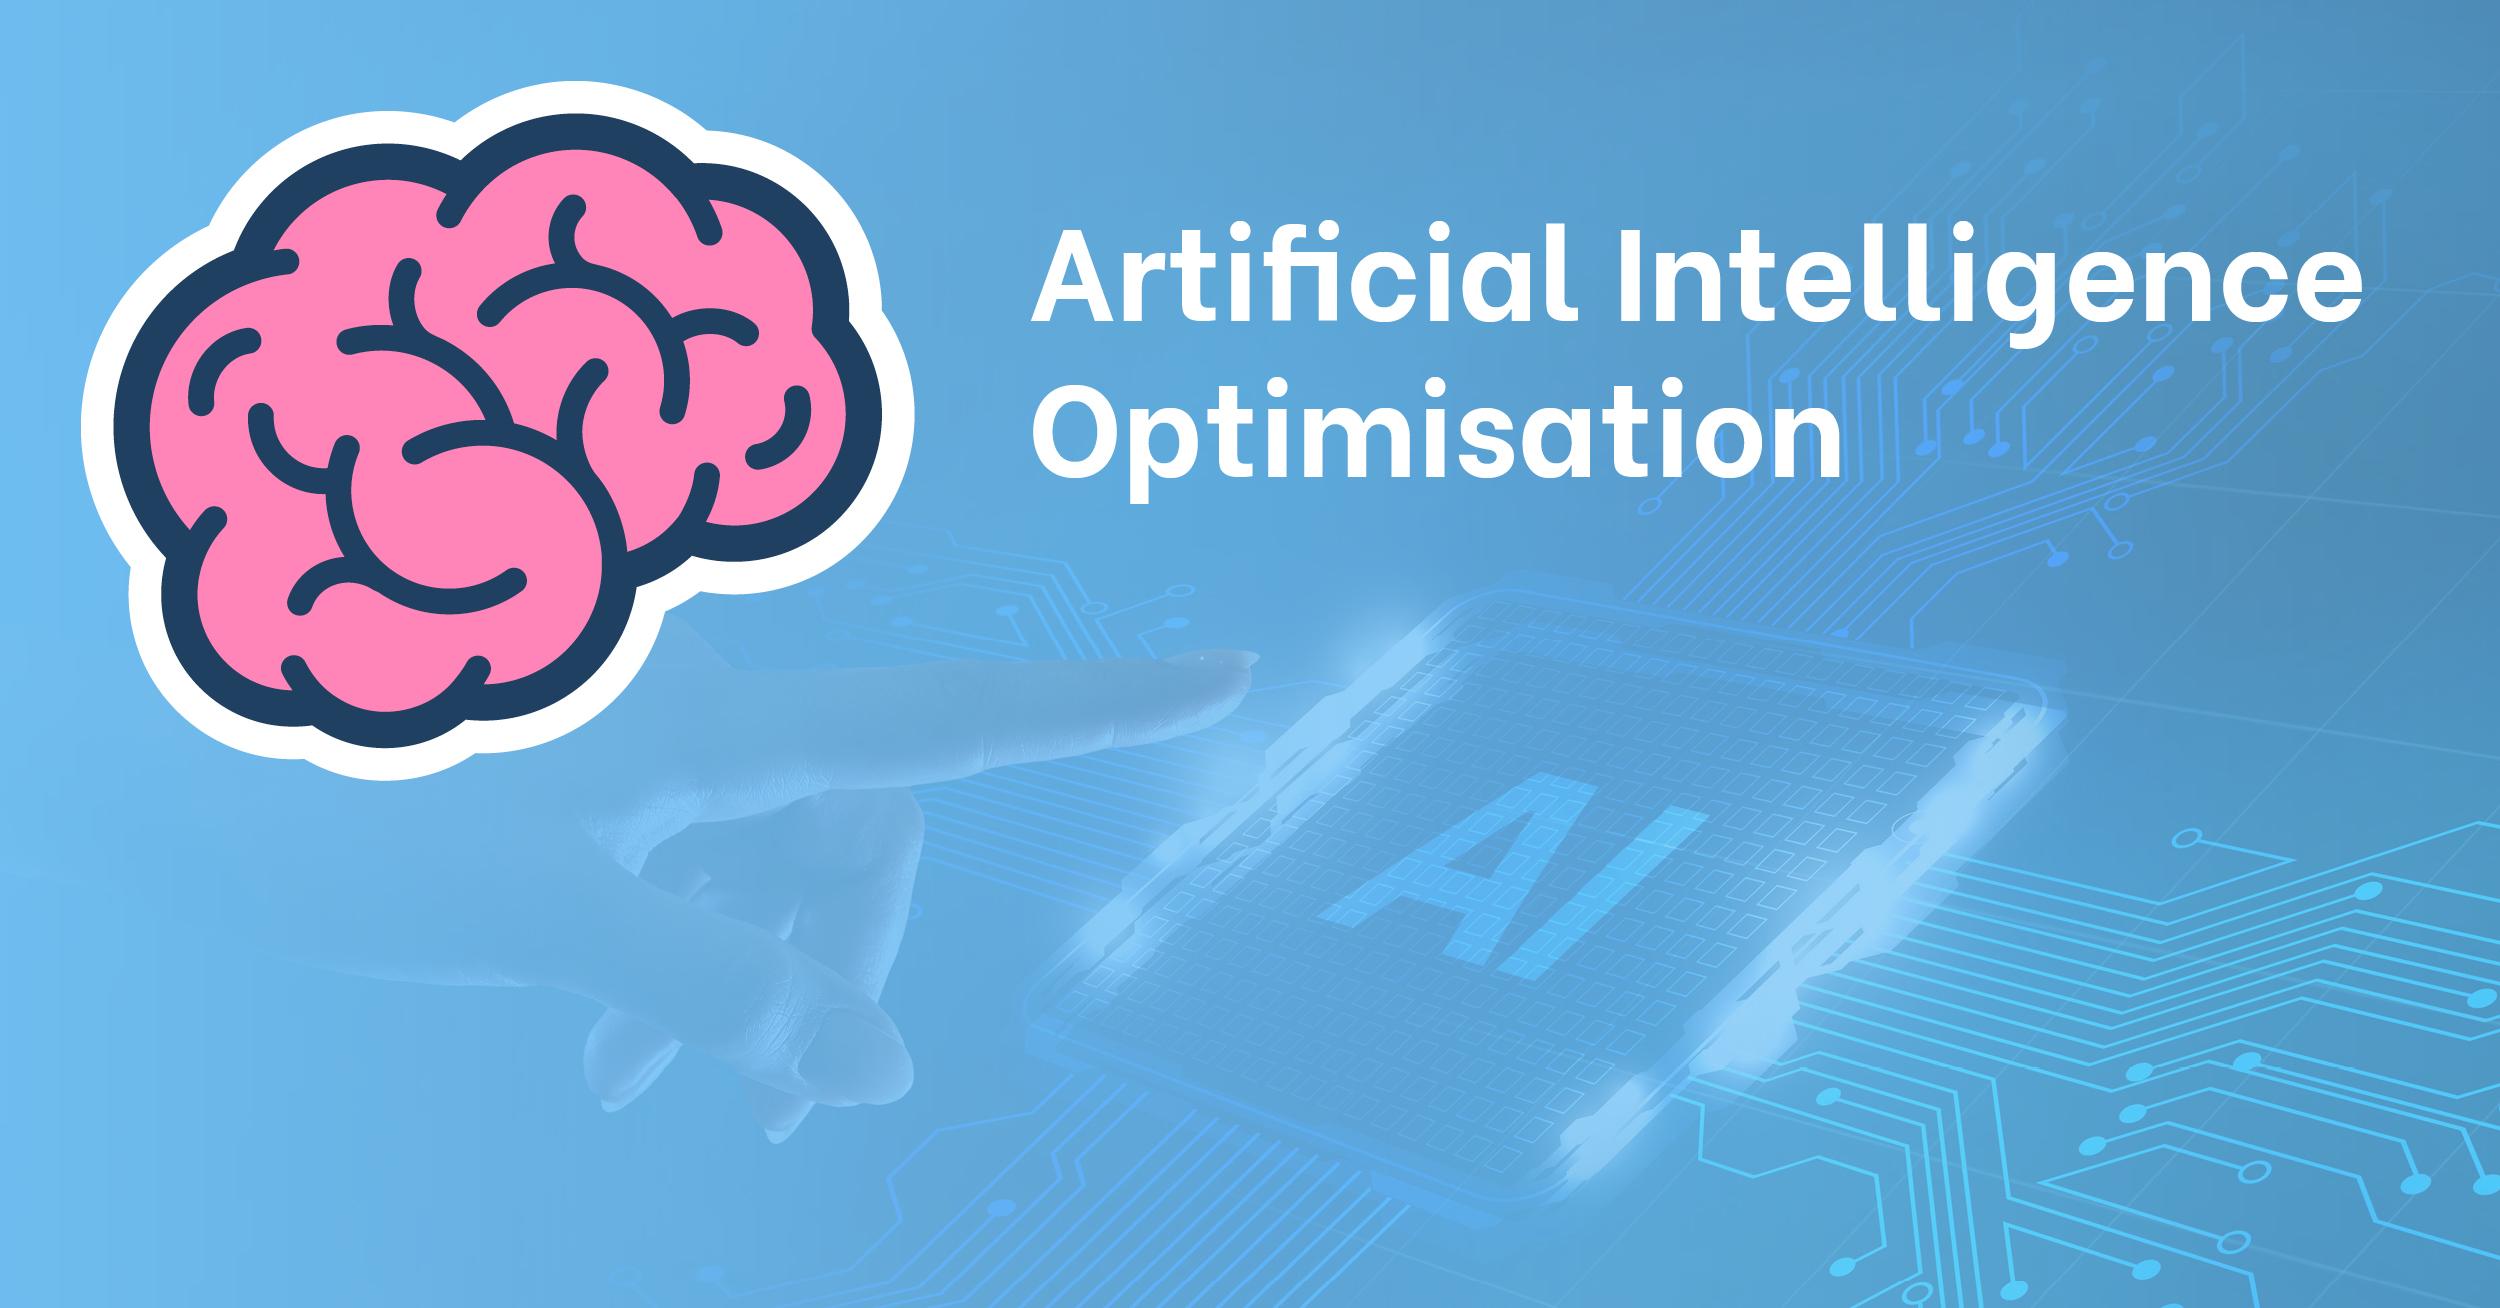 Artificial Intelligence Optimisation